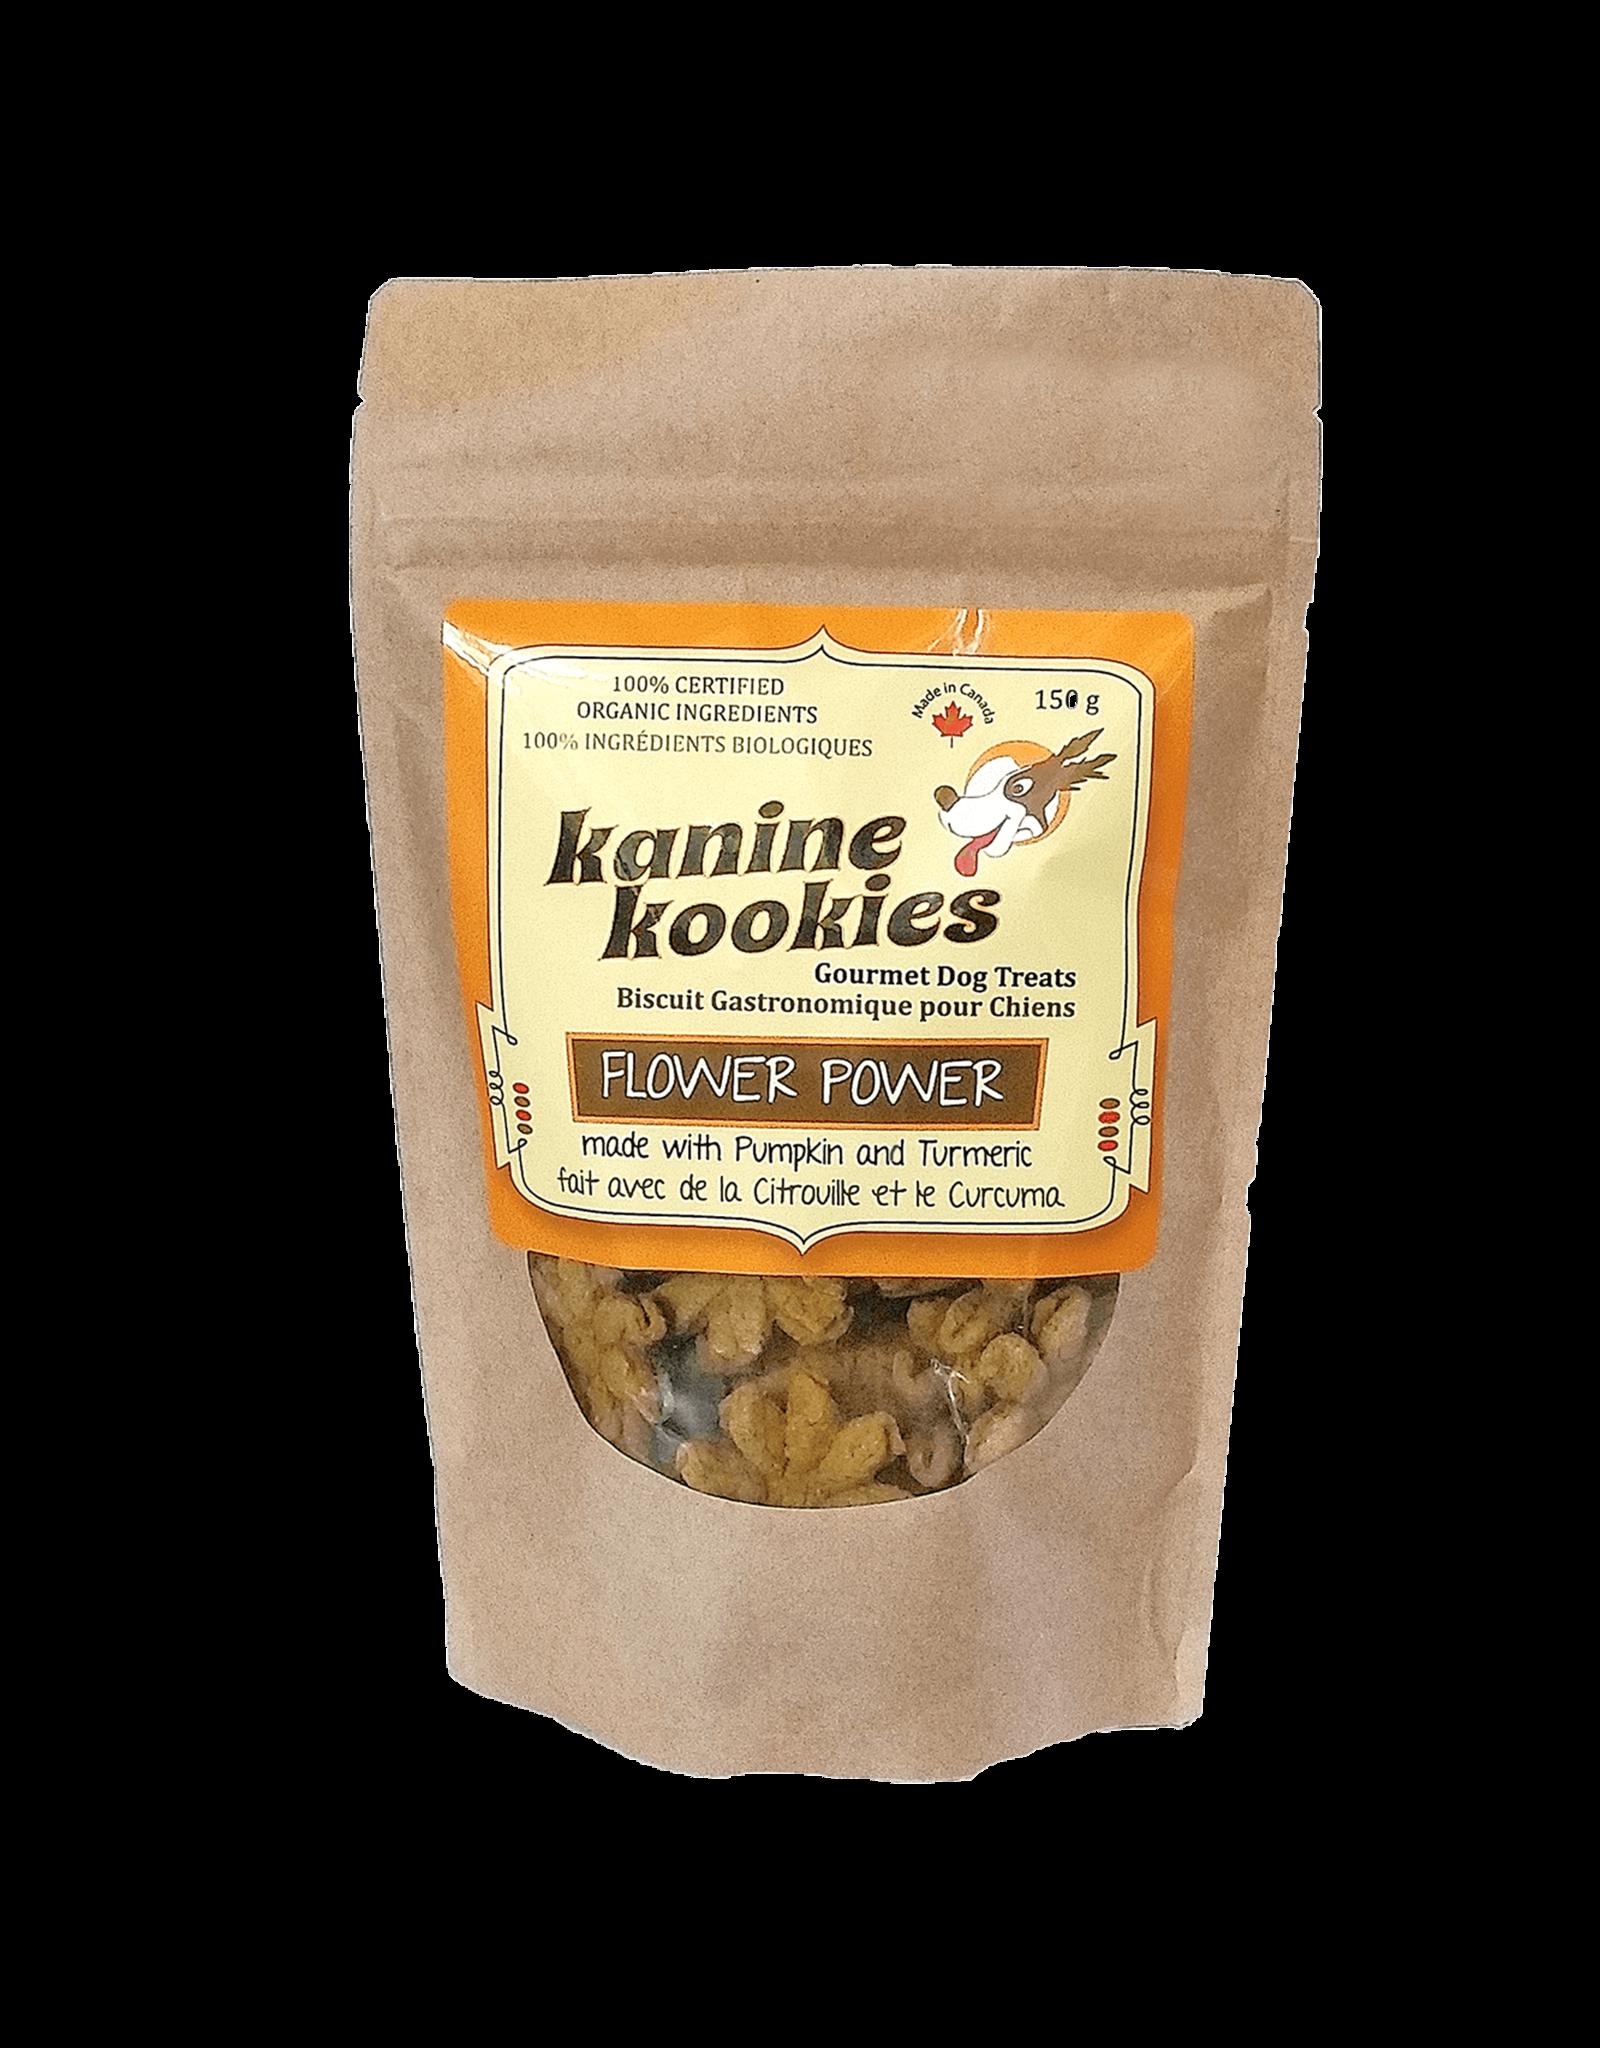 Better Bickies Kanine Kookies Dog Treats